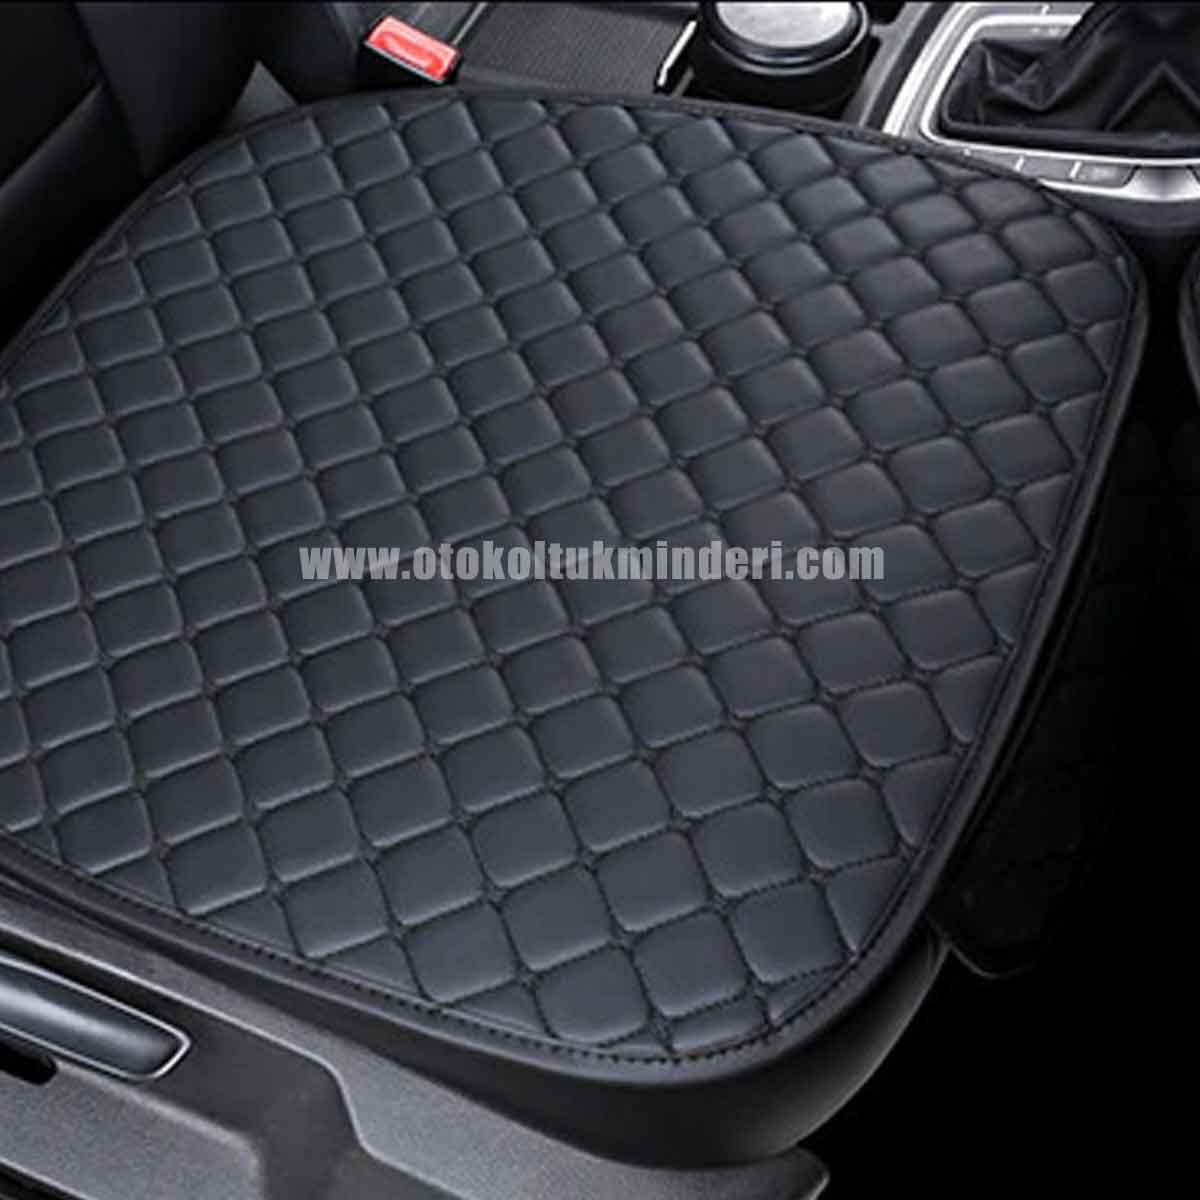 Fiat oto koltuk kılıfı - Fiat Koltuk minderi Siyah Deri Cepli